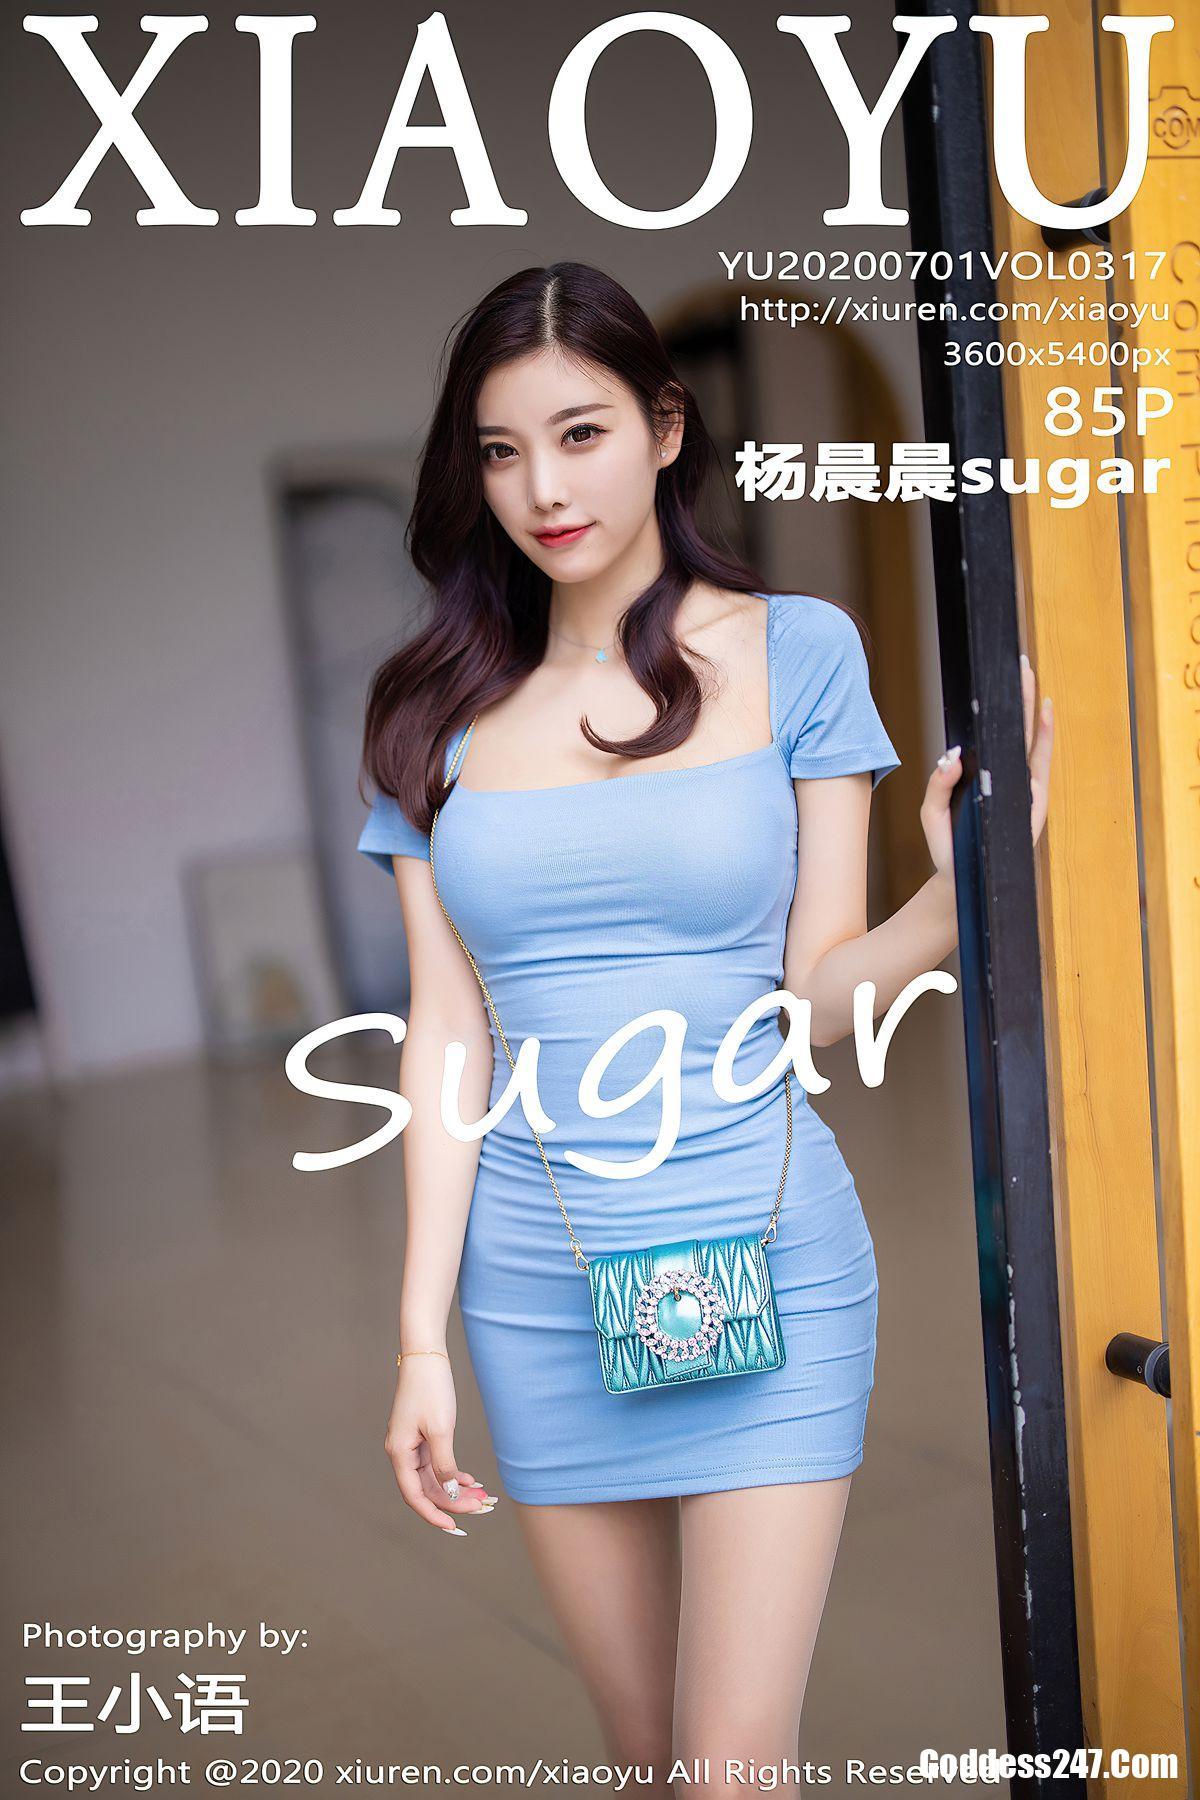 XiaoYu Vol.317 杨晨晨sugar